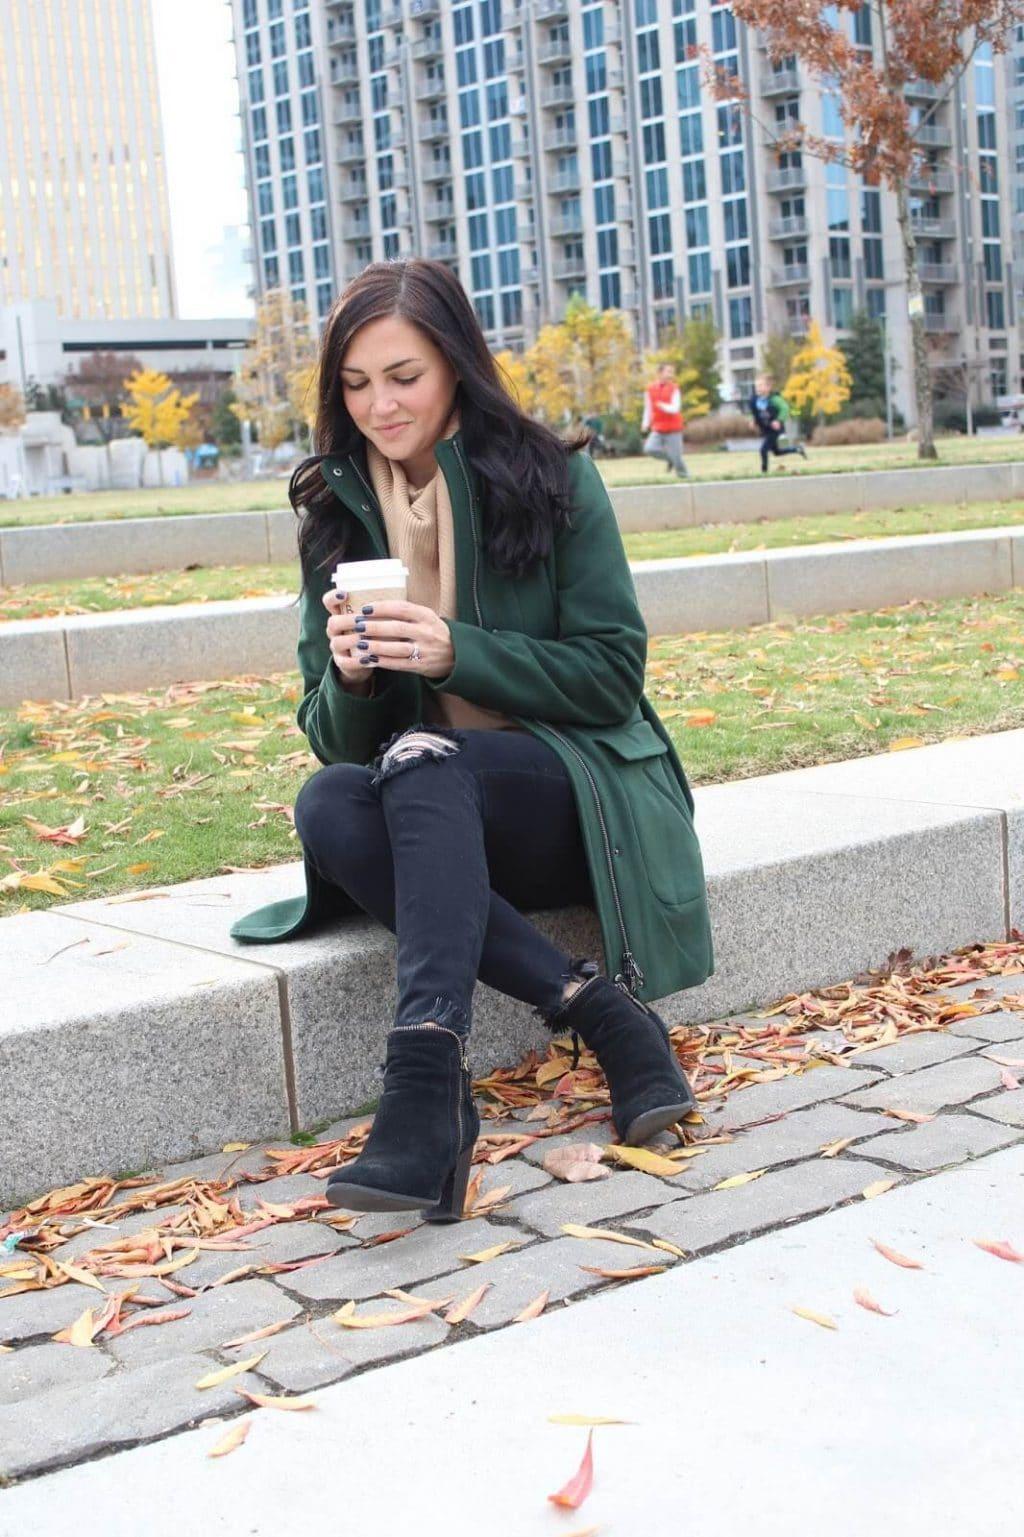 J Jill Hunter green coat | Cowl Neck Nordstrom Sweater | Distressed Black Denim